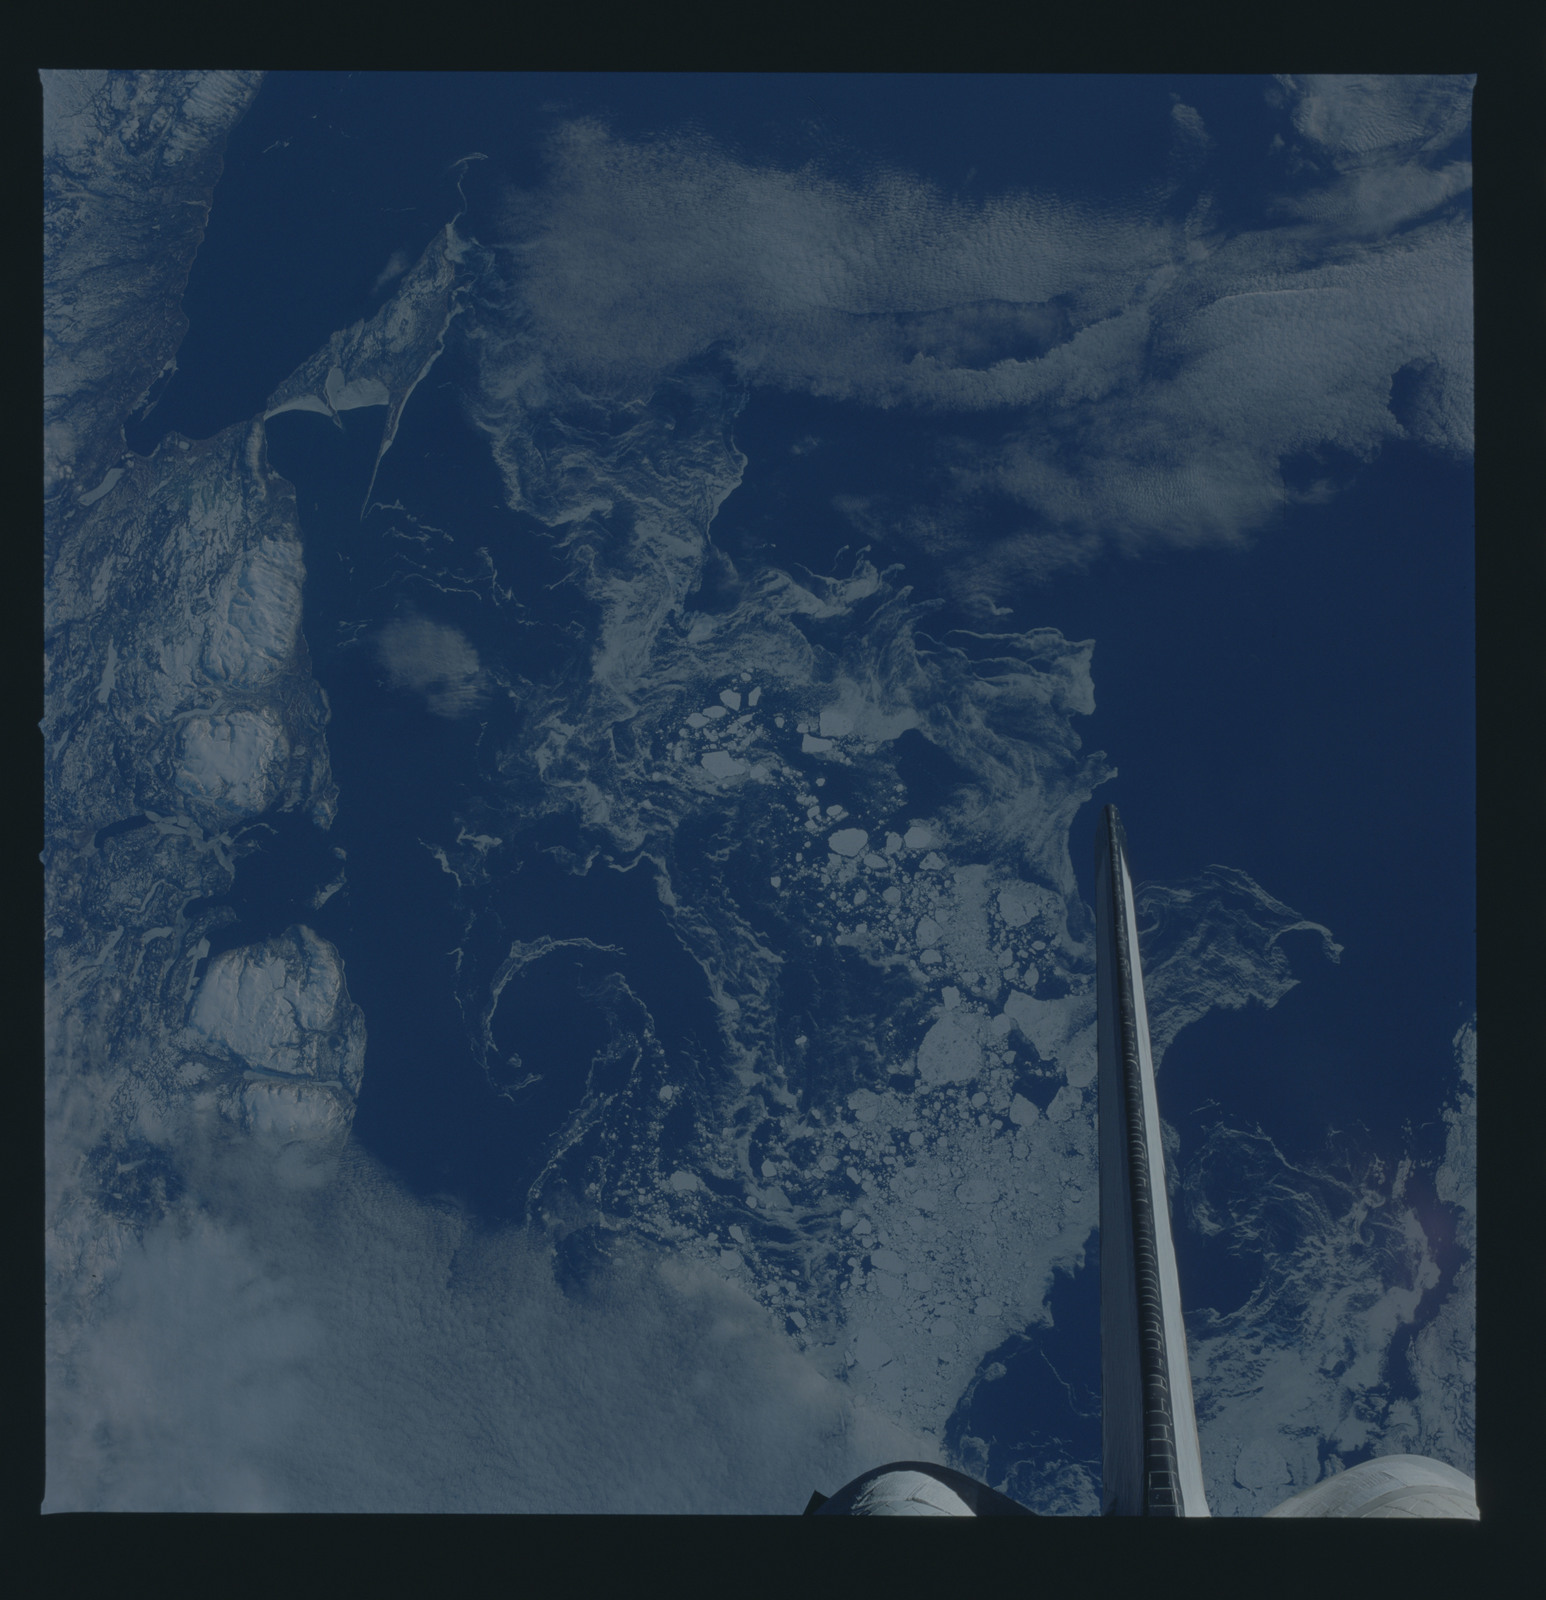 51B-44-018 - STS-51B - 51B earth observation